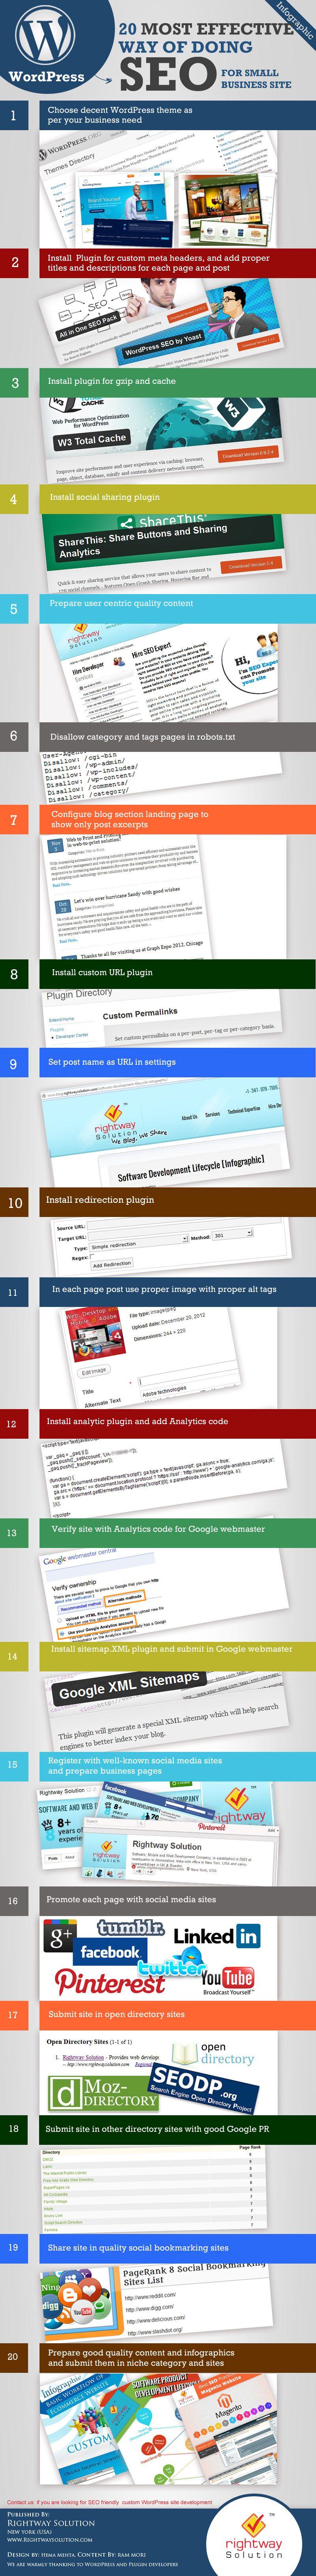 20 WordPress Seo Guide Infographic Seo Marketing Infographic Marketing Seo Guide